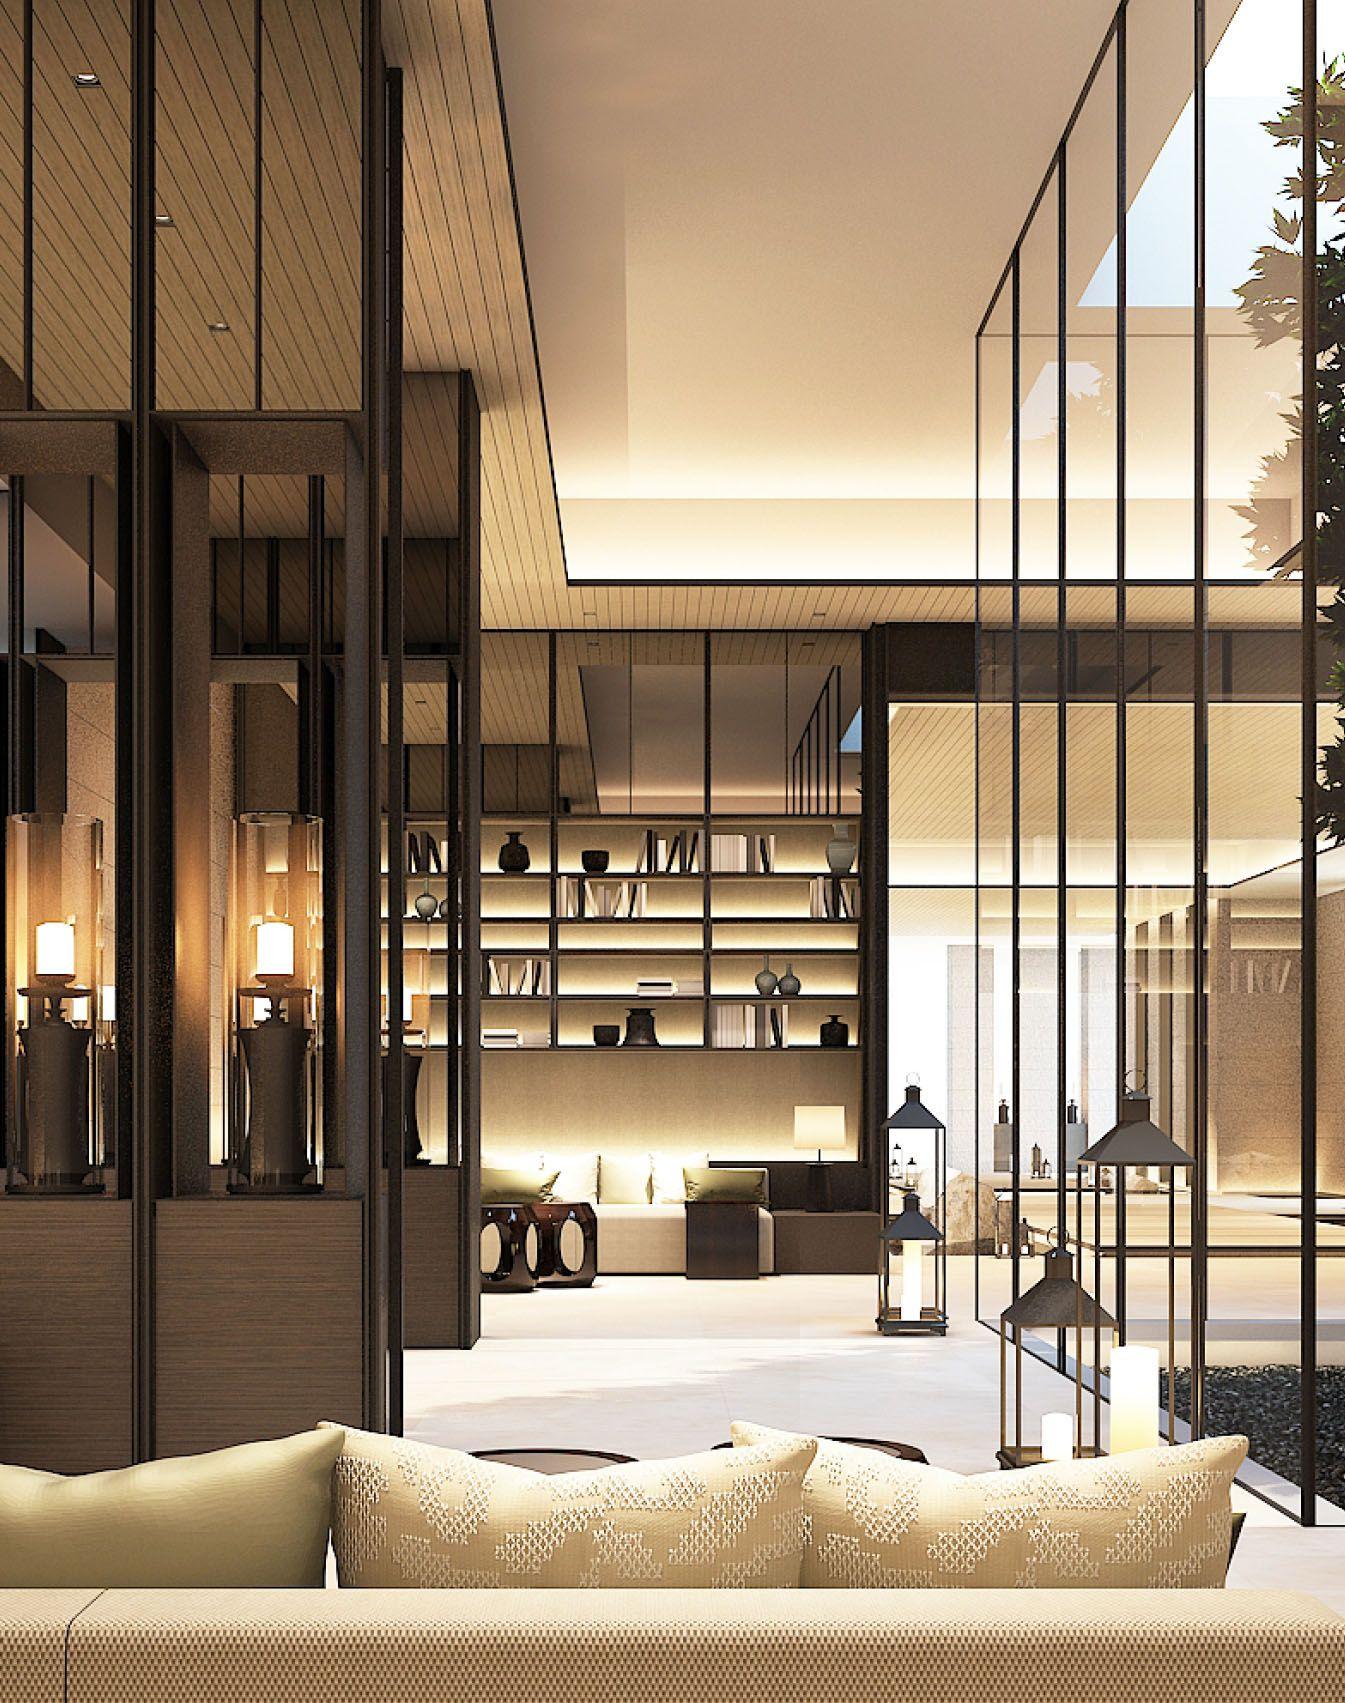 scda hotel mixed use development nanjing china spa courtyard rh pinterest com